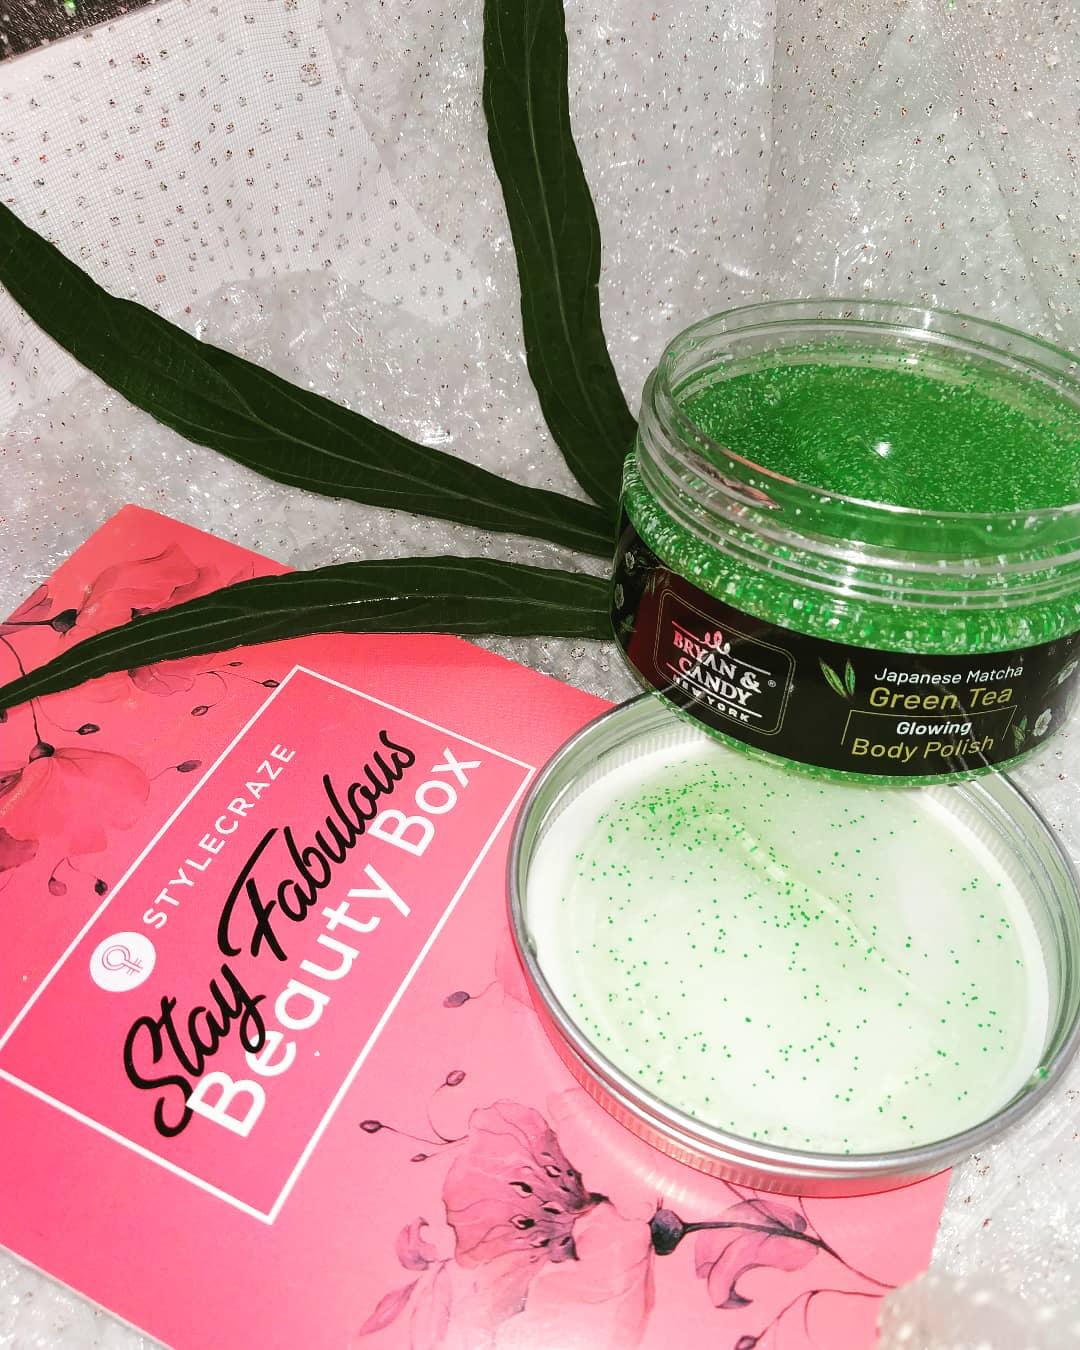 Bryan & Candy New York Green Tea Body Polish-Miraculous Microbeads-By ishikatanwar